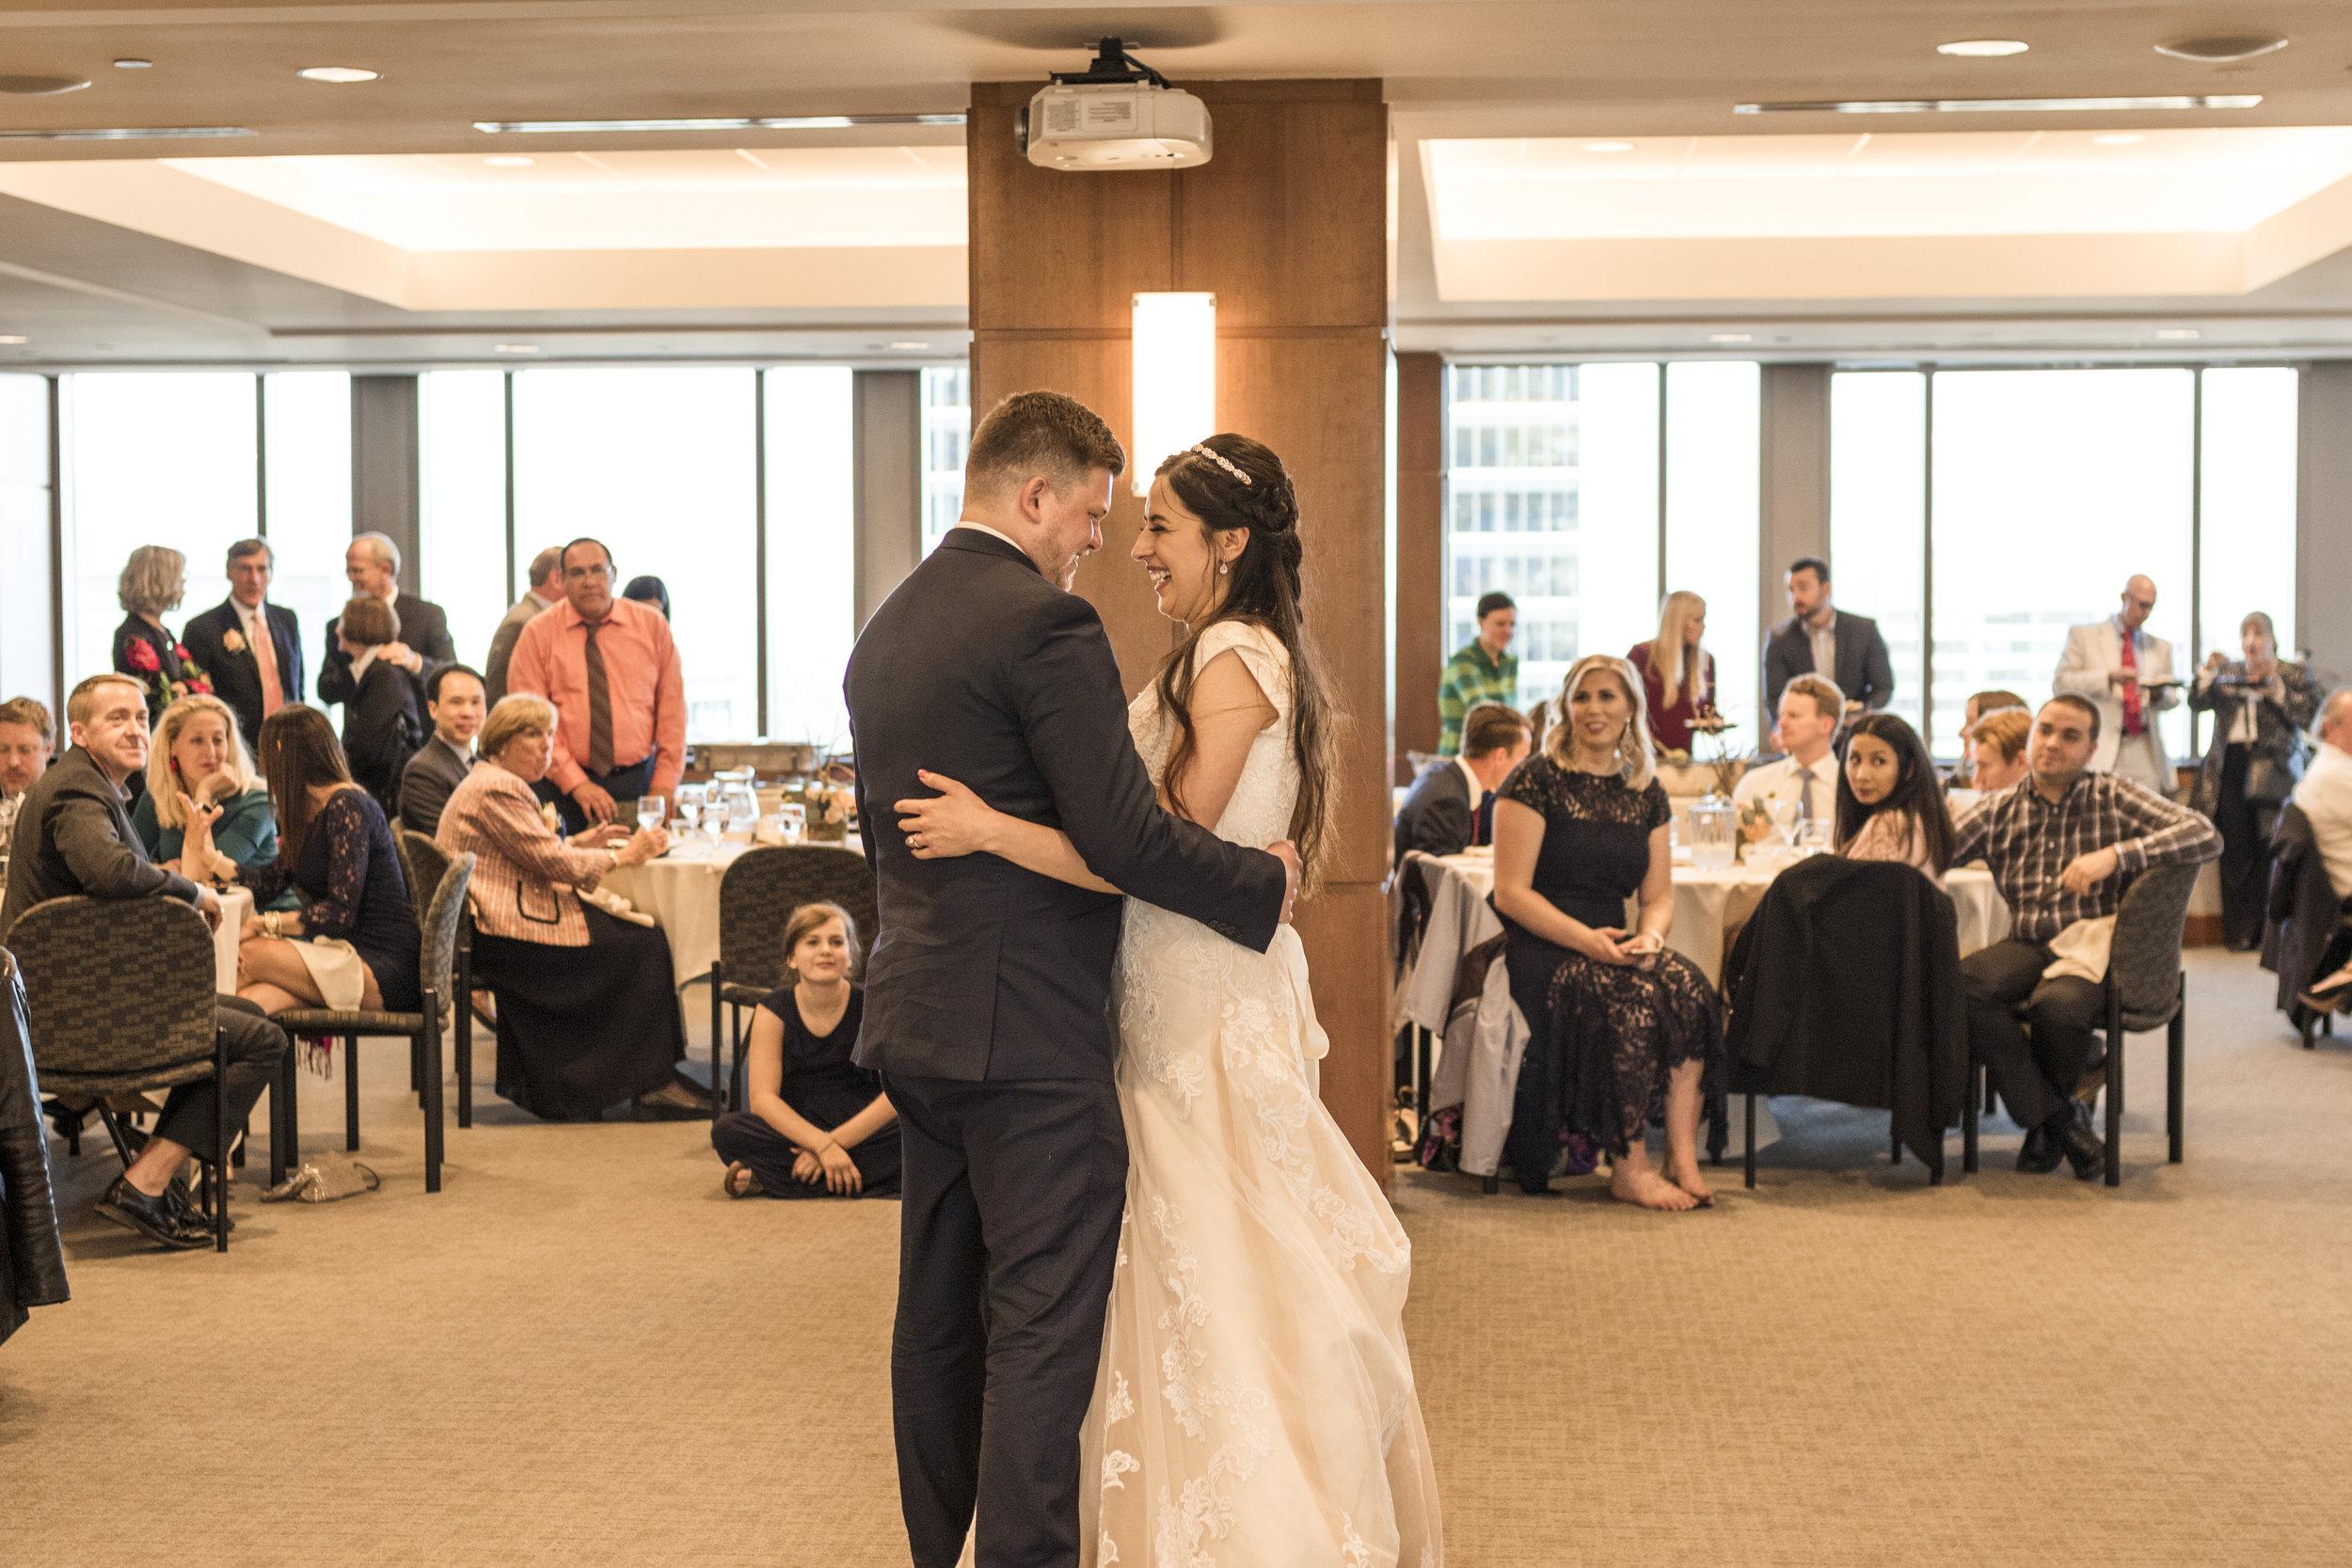 Utah Spring Wedding Reception in the Zions Bank Founders Room by Bri Bergman Photography11.JPG